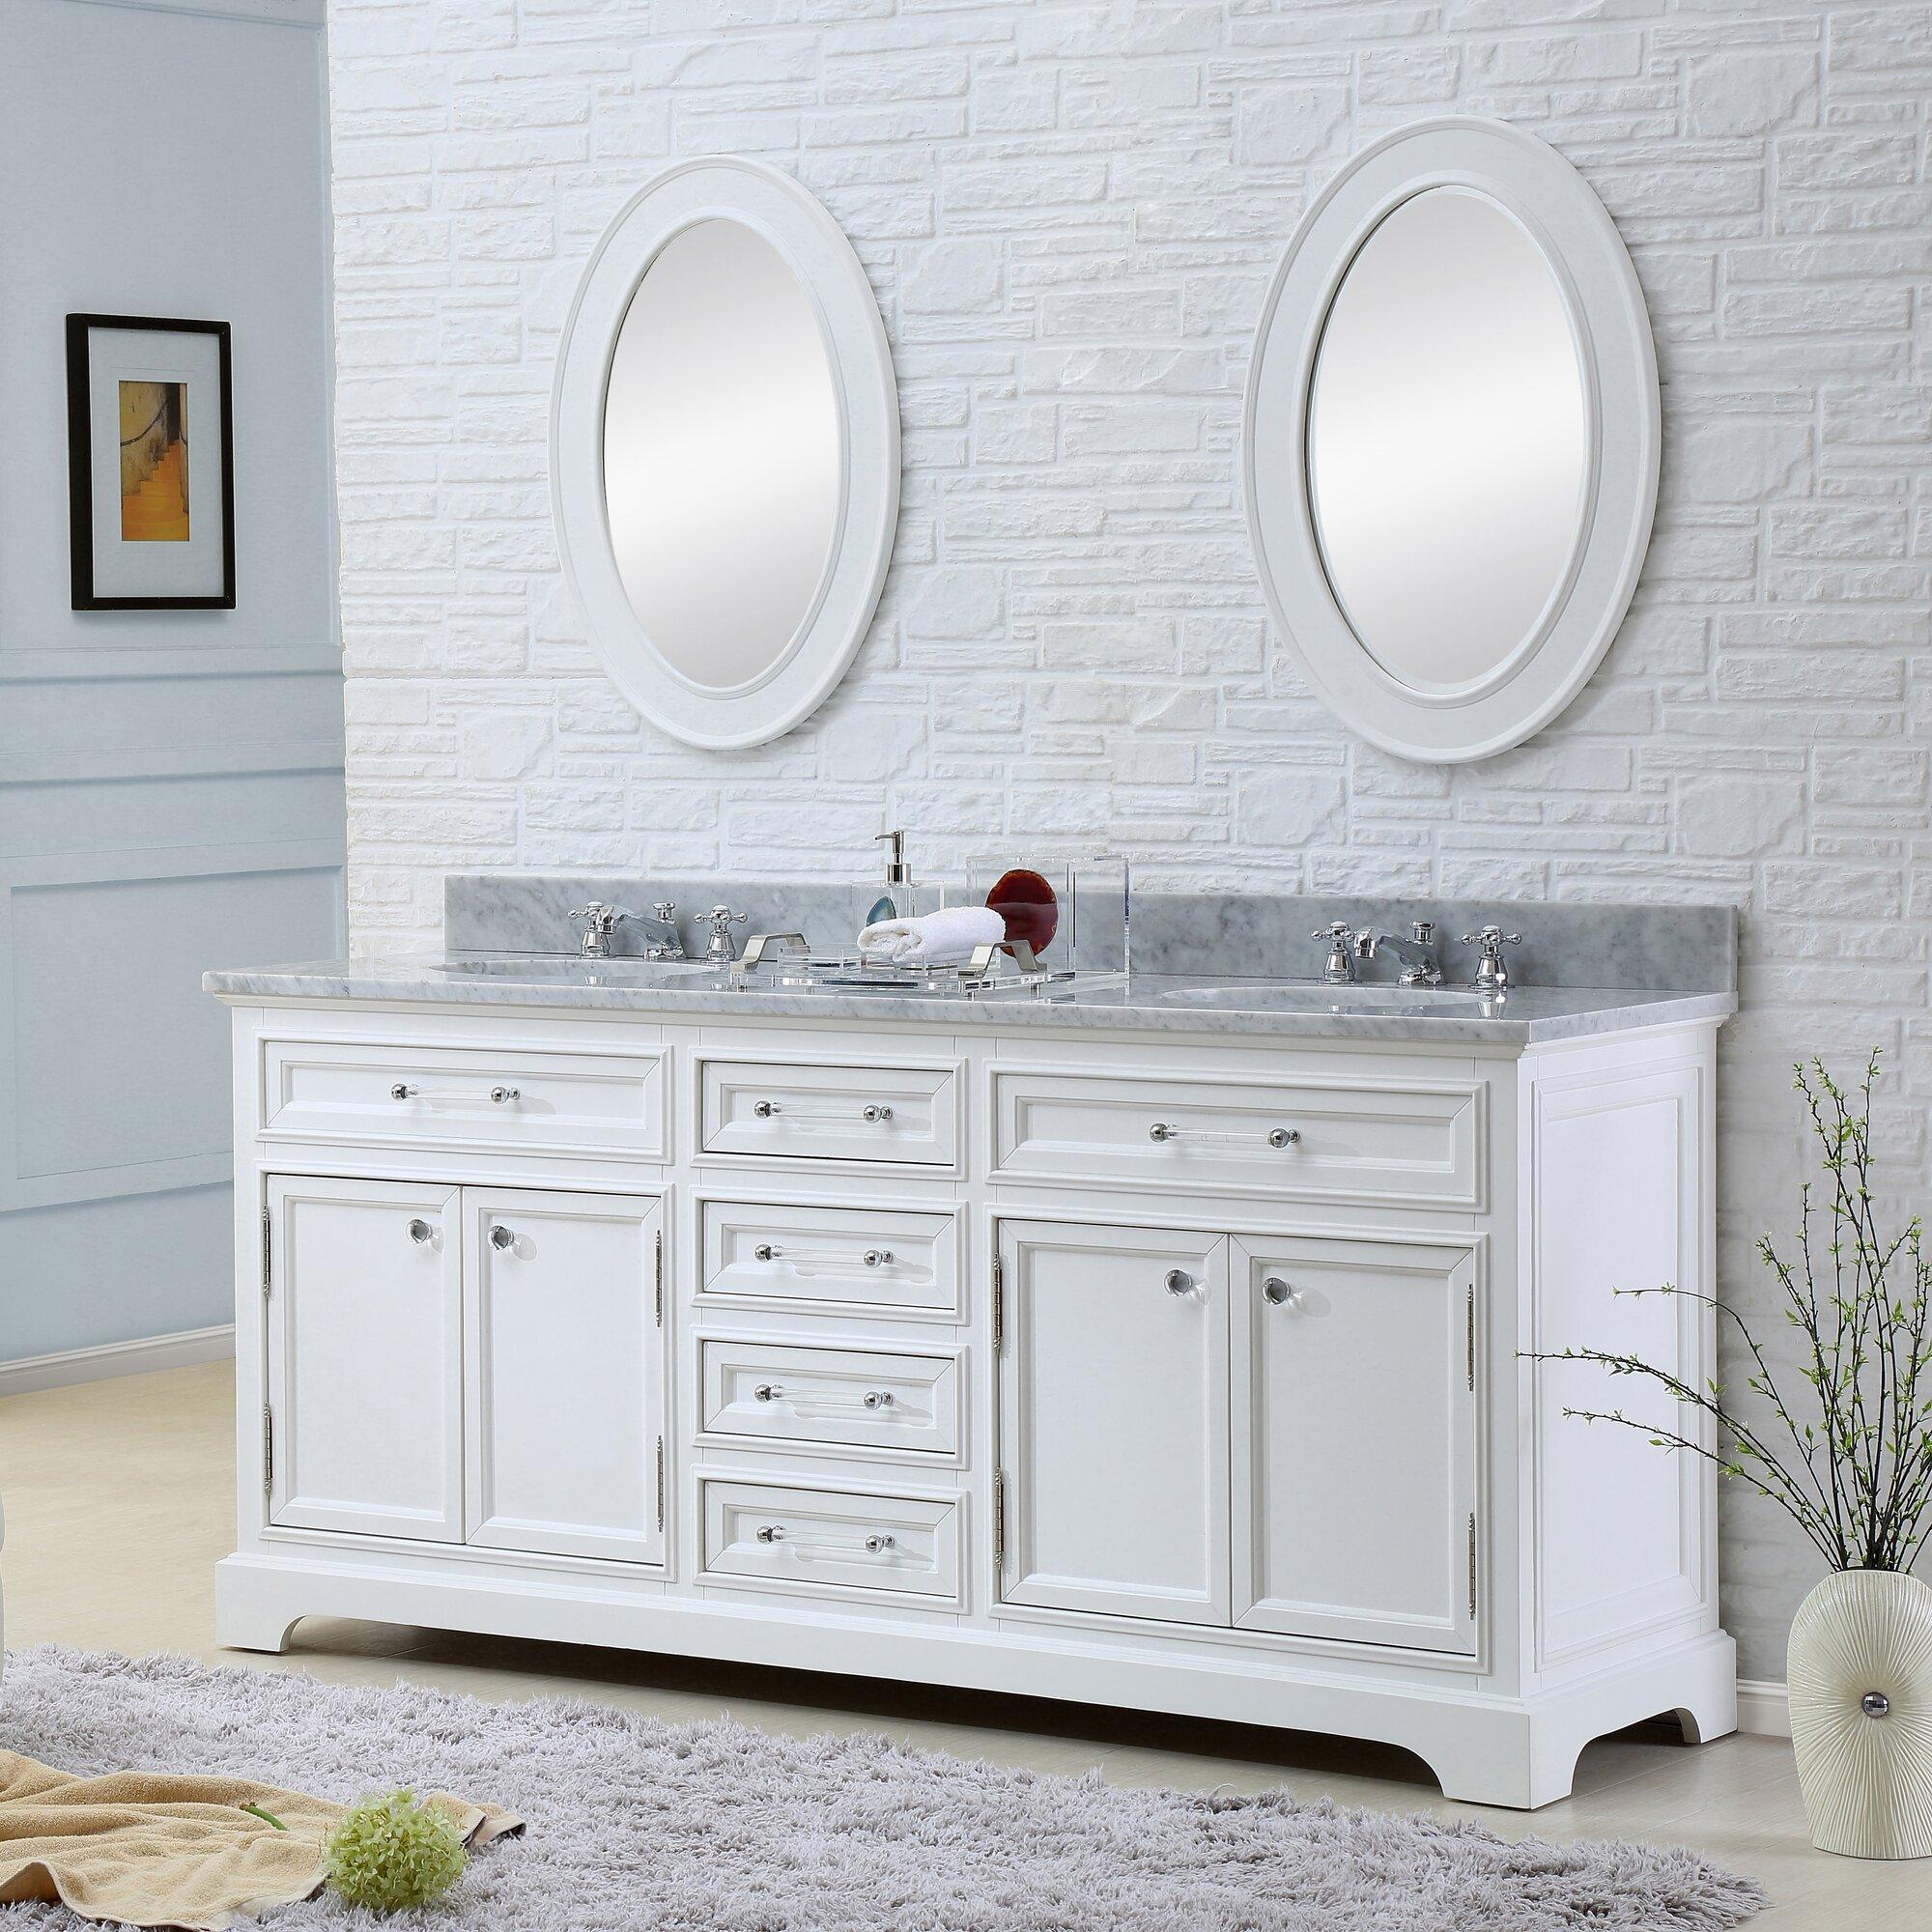 72 white bathroom vanity - Colchester 72 Double Sink Bathroom Vanity Set With Mirror White